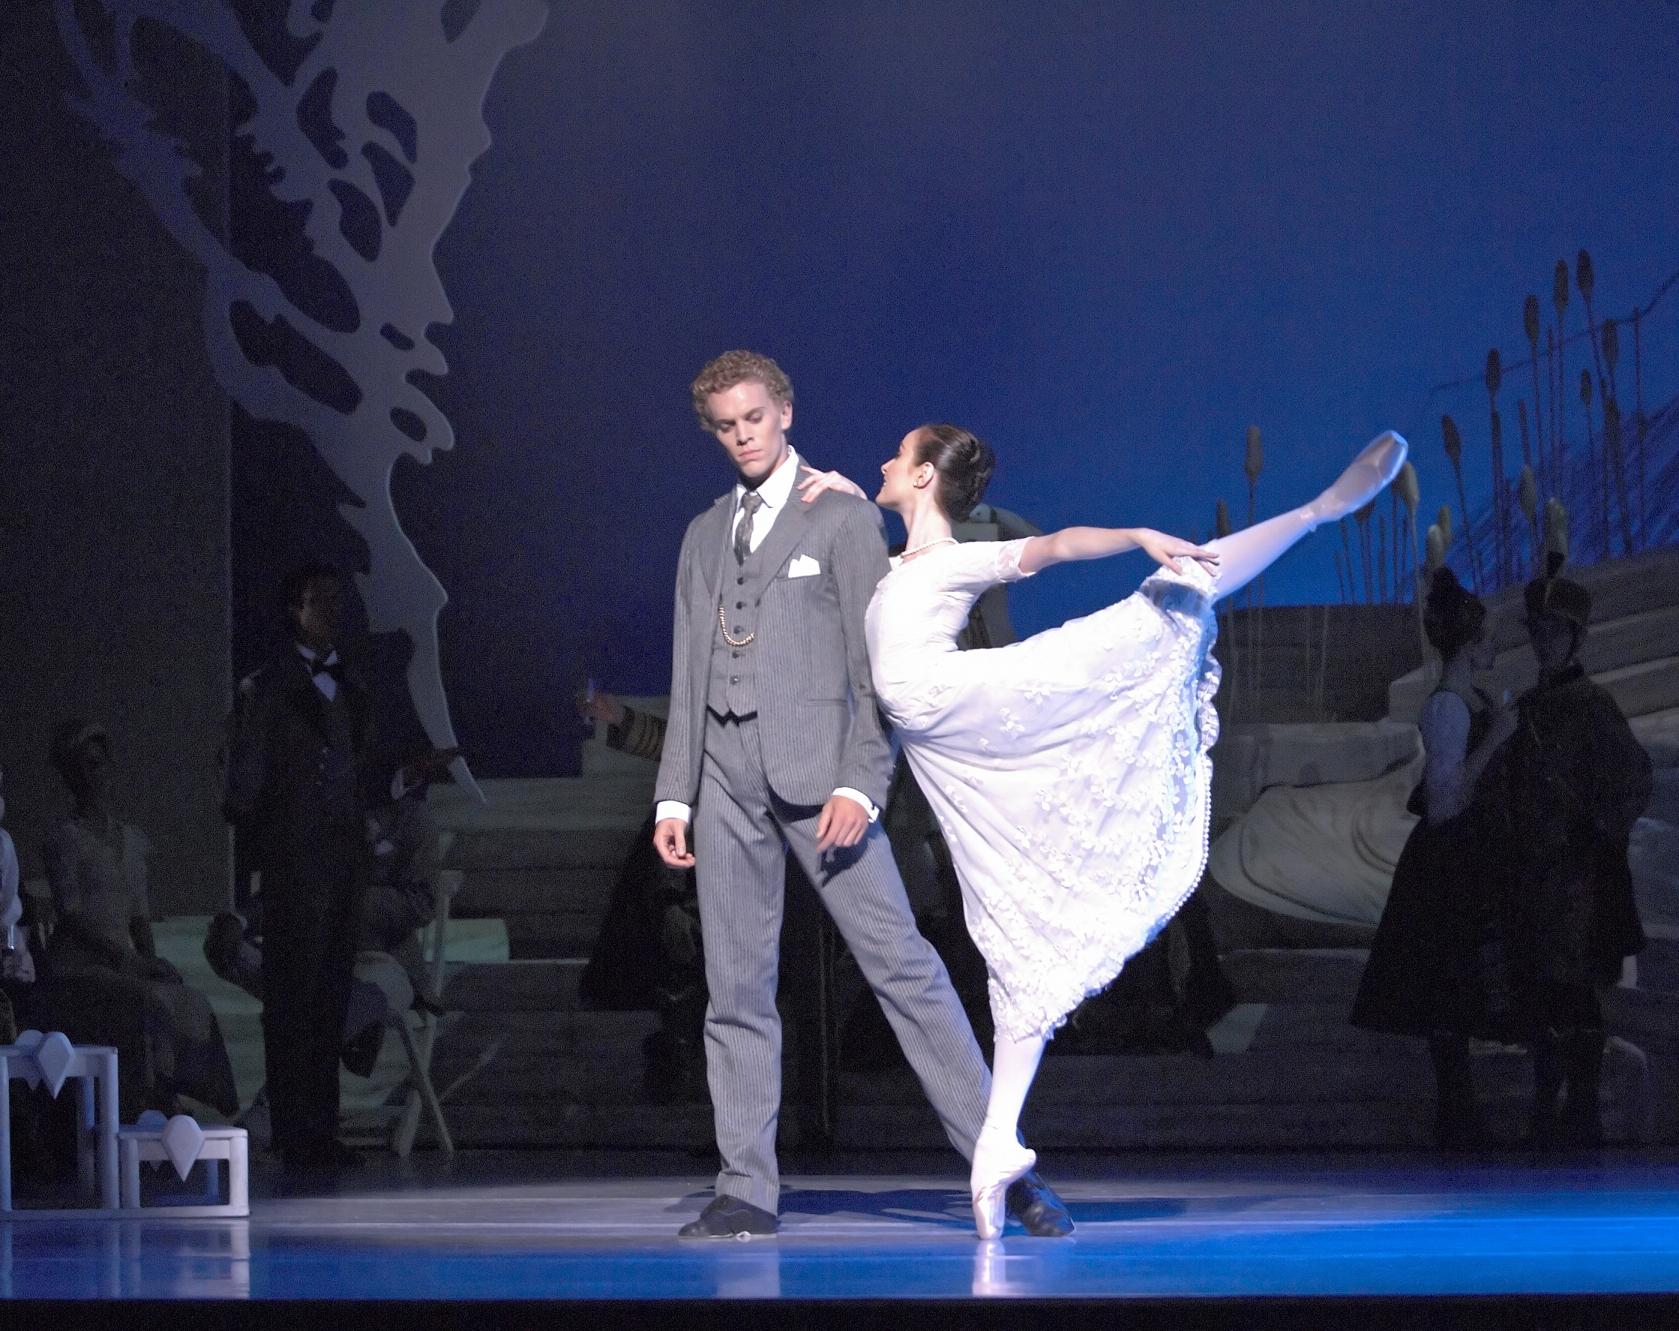 https://i2.wp.com/images.huffingtonpost.com/2012-06-12-dance2.jpg